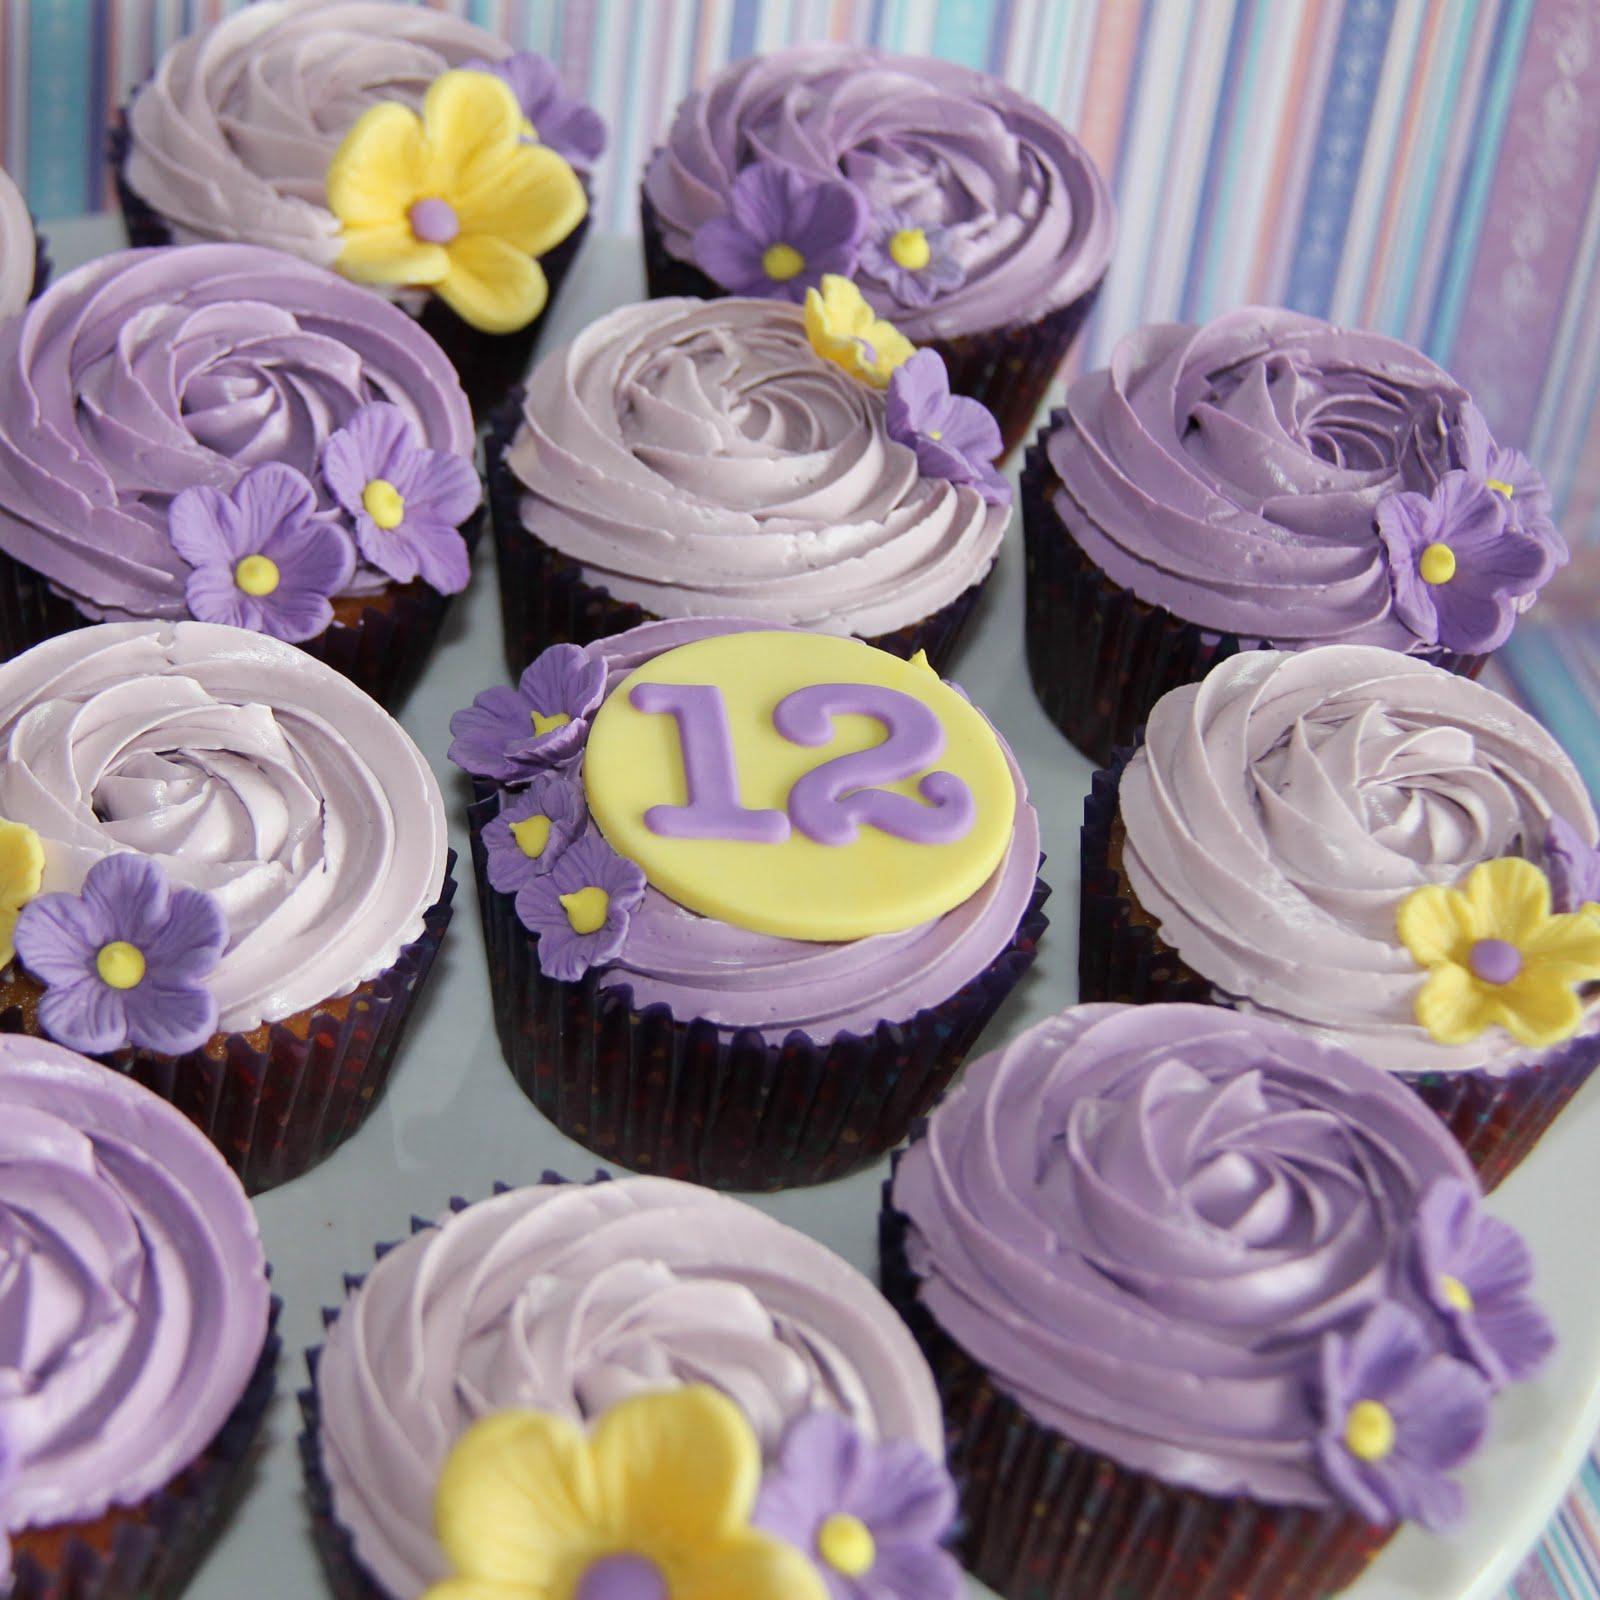 Coco Jo Cake Design: 12th Birthday Cupcakes